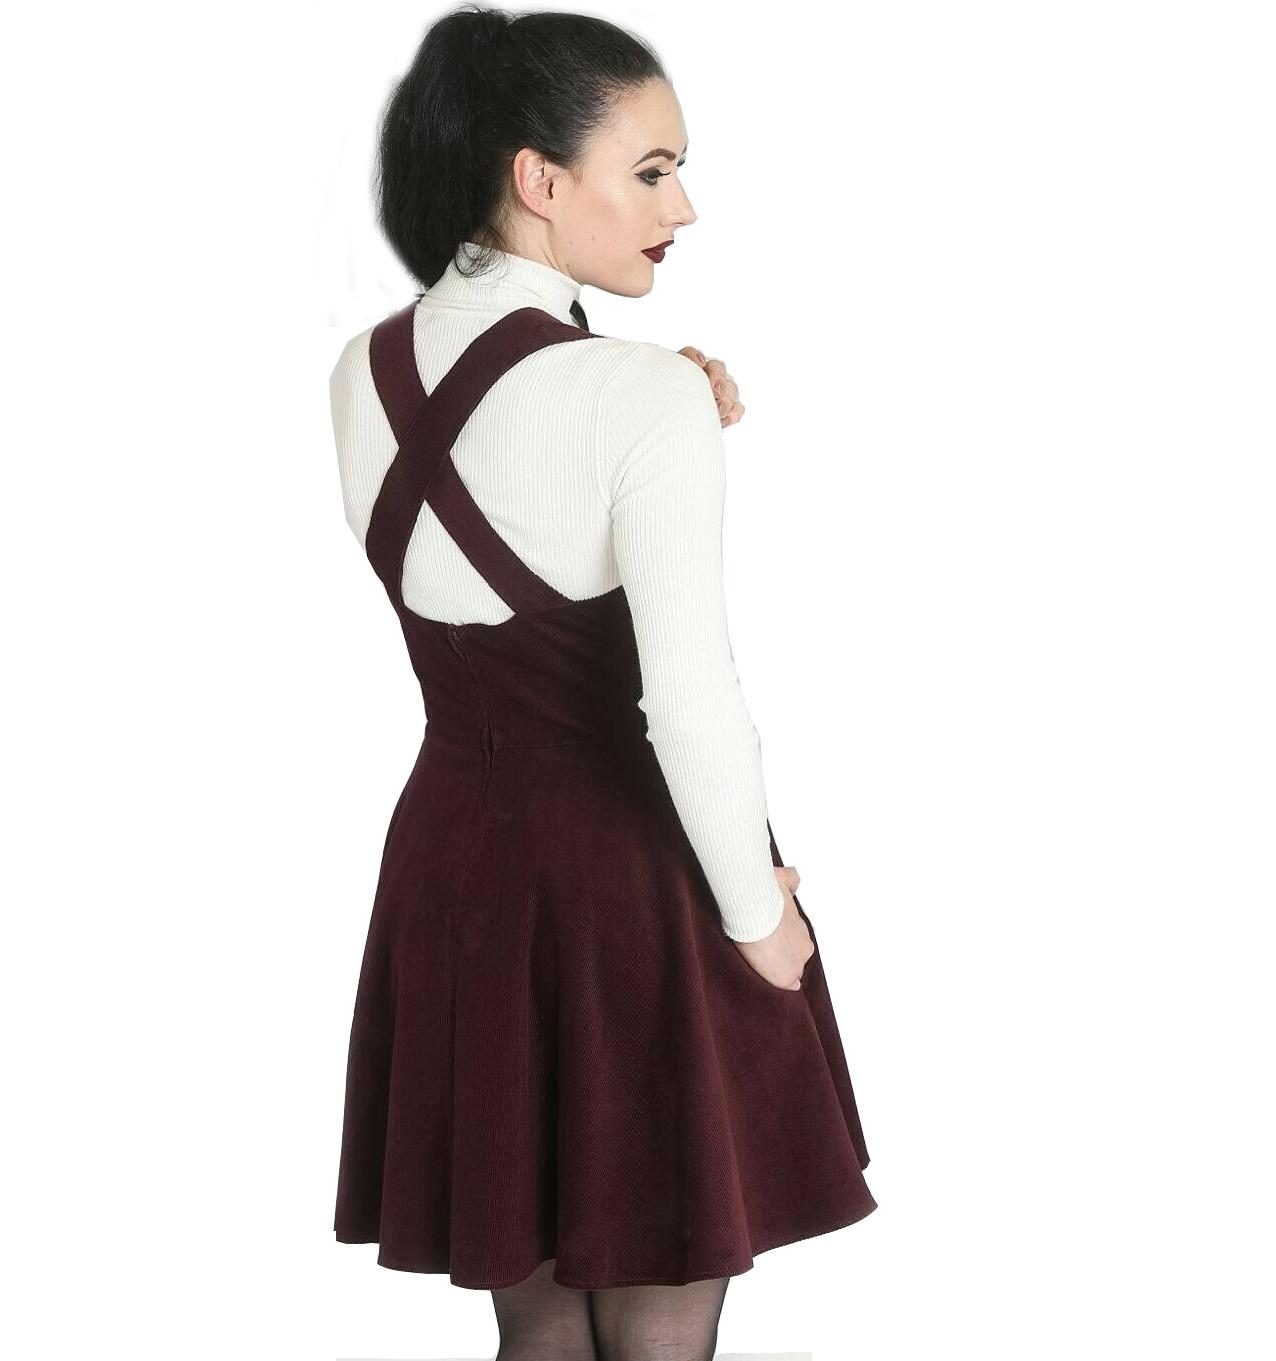 Hell-Bunny-Rockabilly-Corduroy-Mini-Dress-WONDER-YEARS-Pinafore-Wine-All-Sizes thumbnail 29